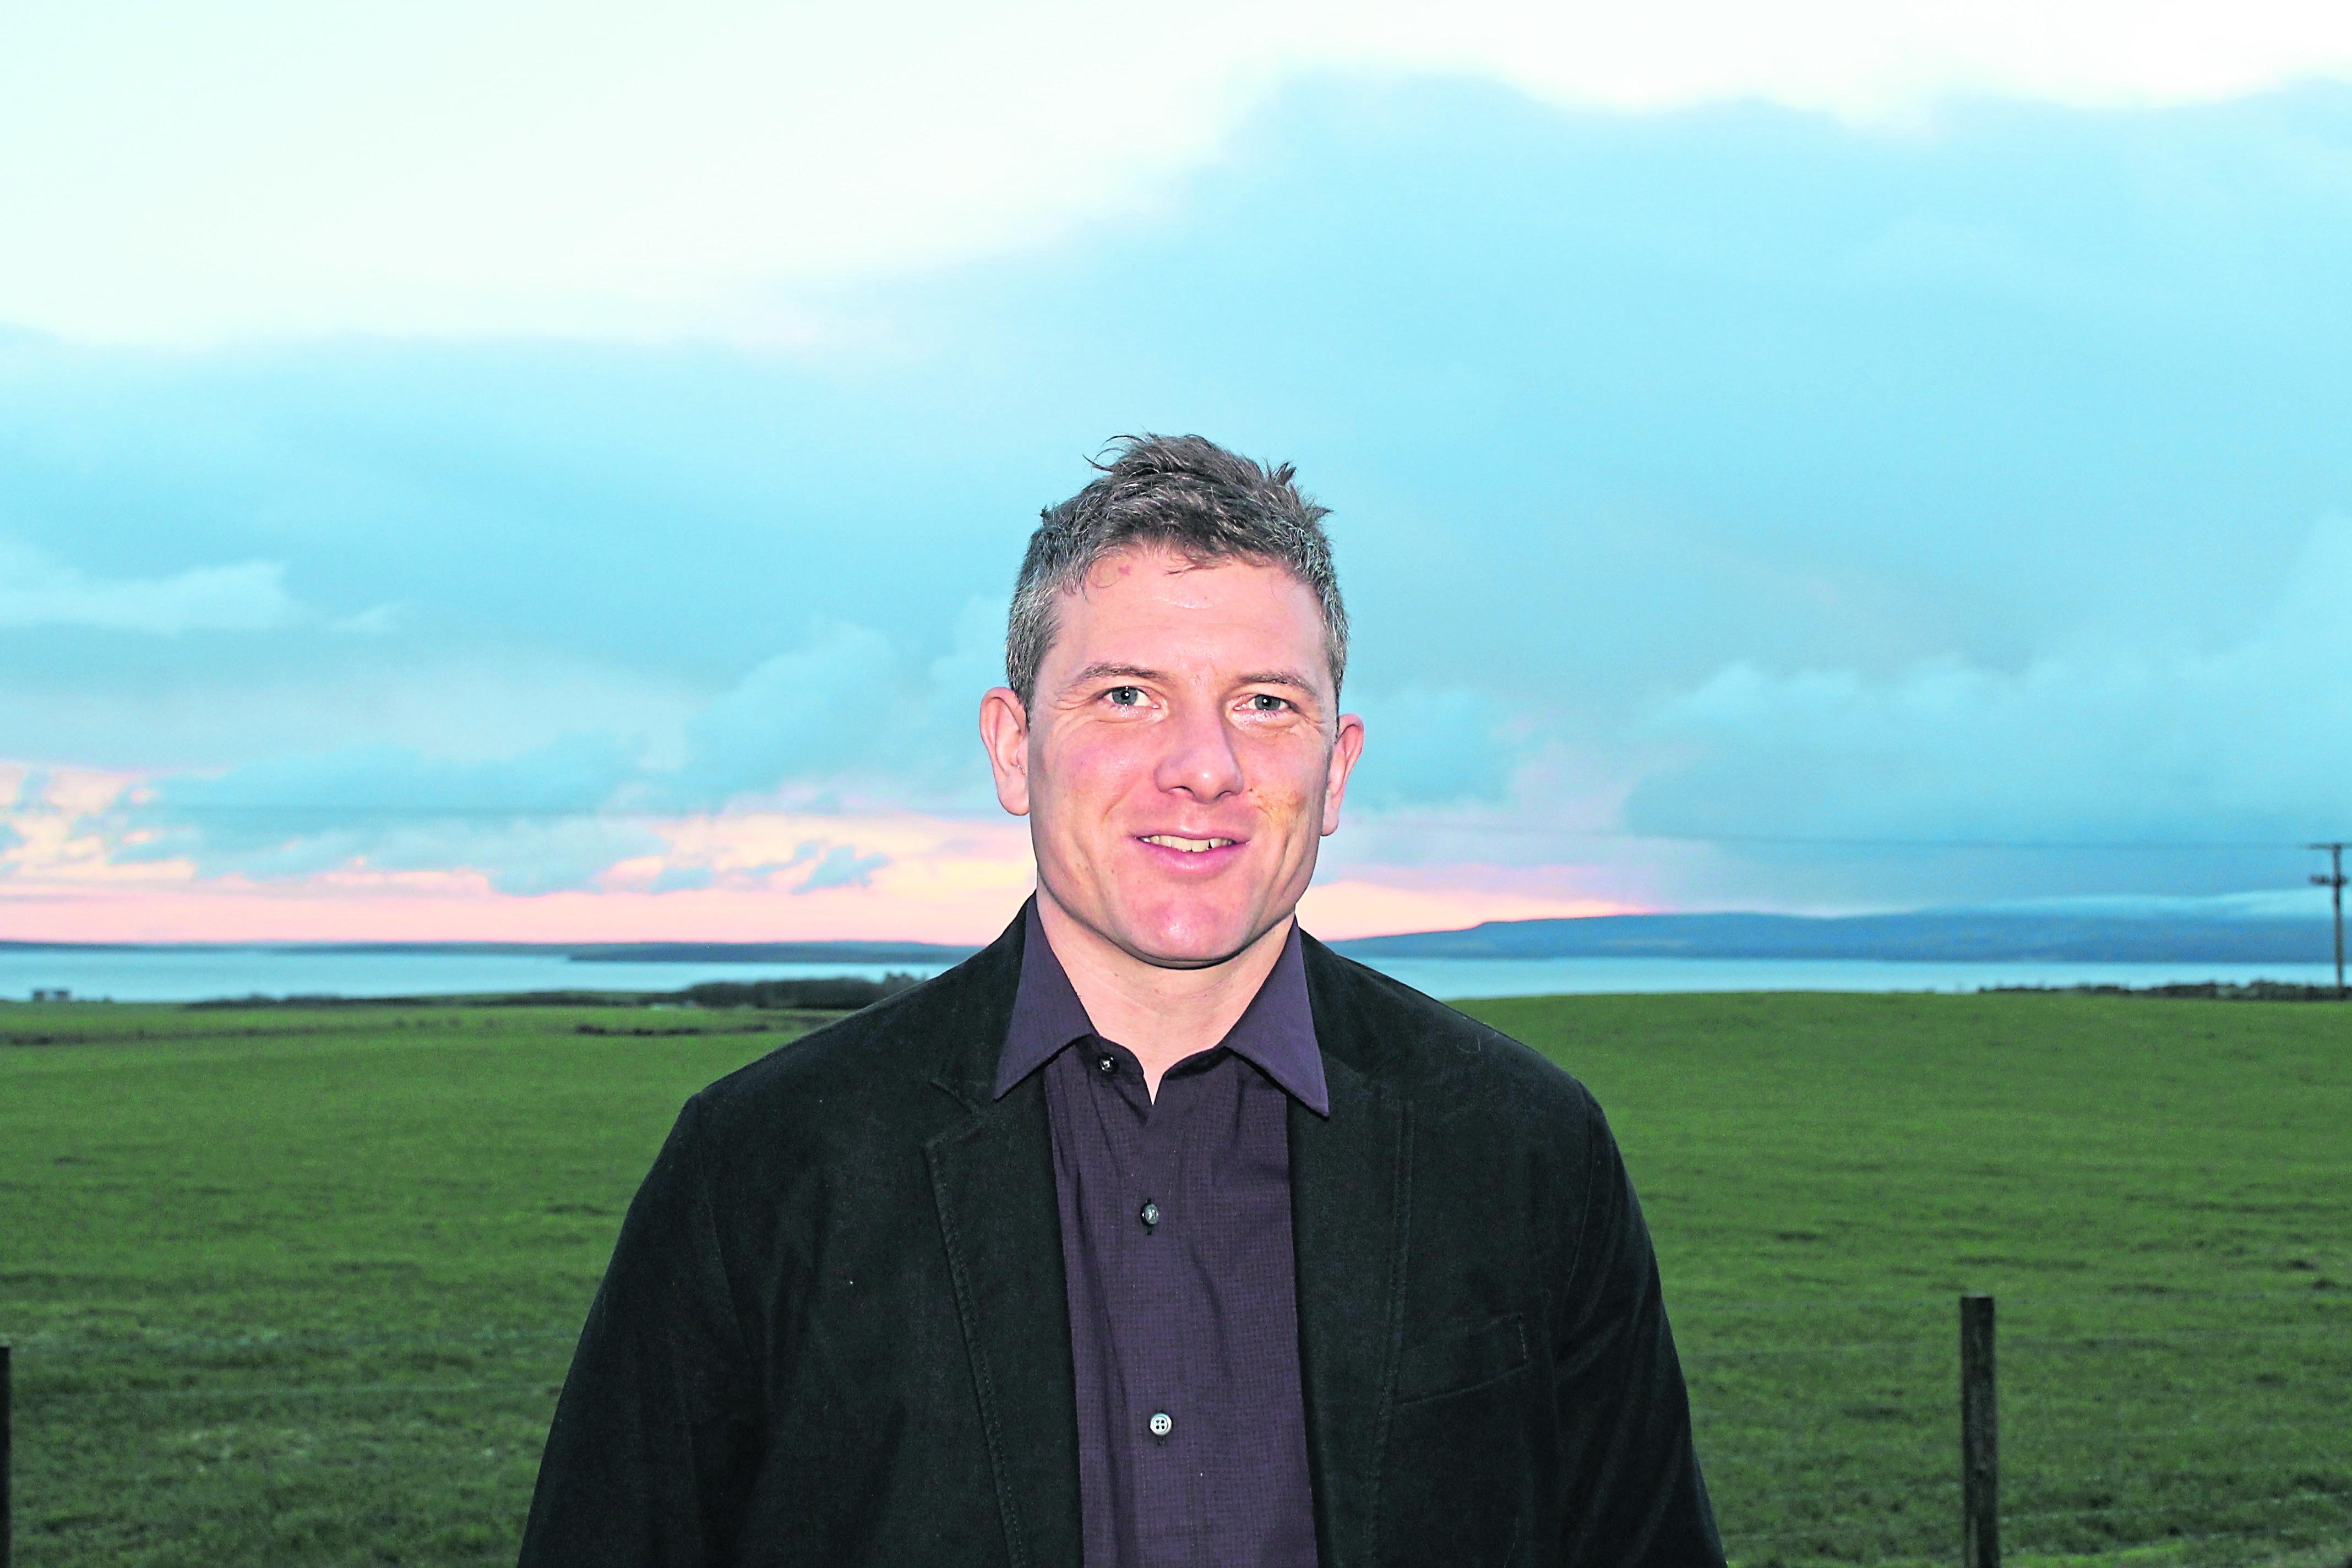 John McGlynn, ORIC executive manager